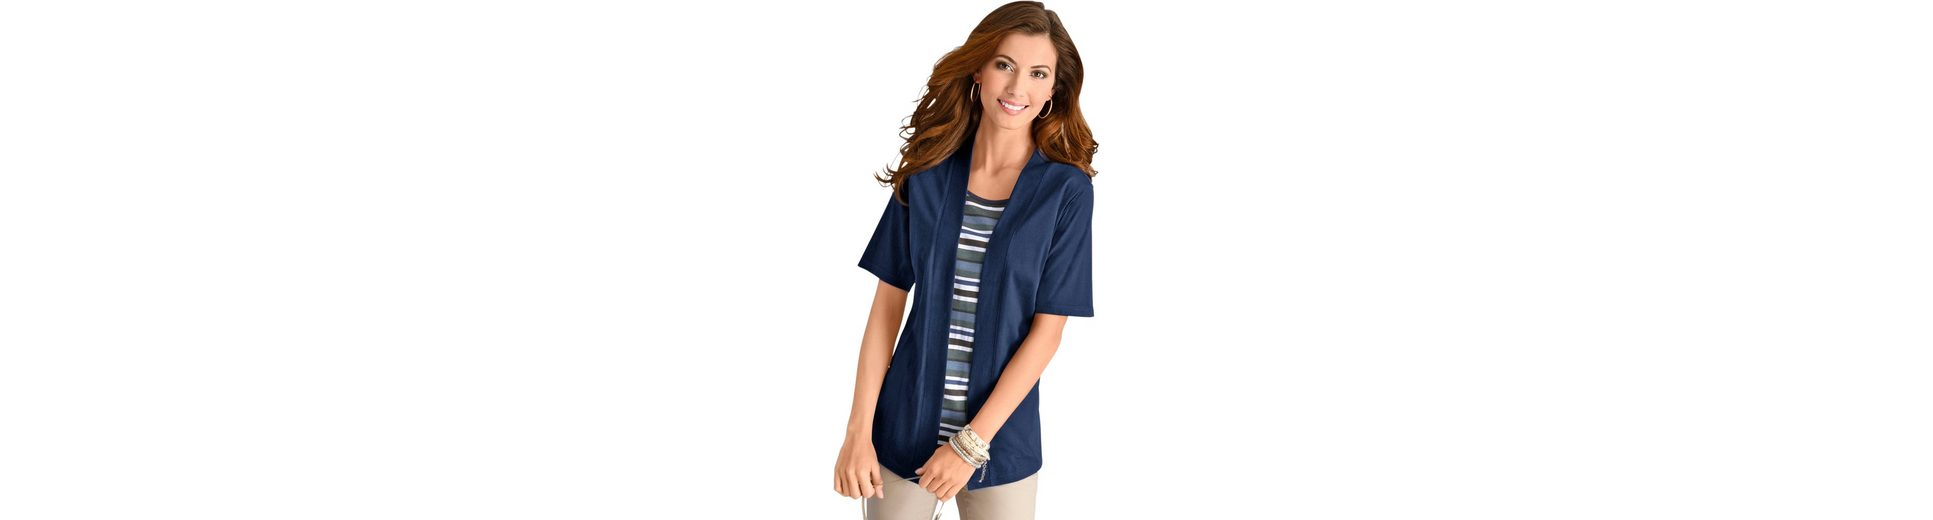 Classic Basics Shirt im beliebten Lagen-Look Billig 2018 Neu DFMRUXoB